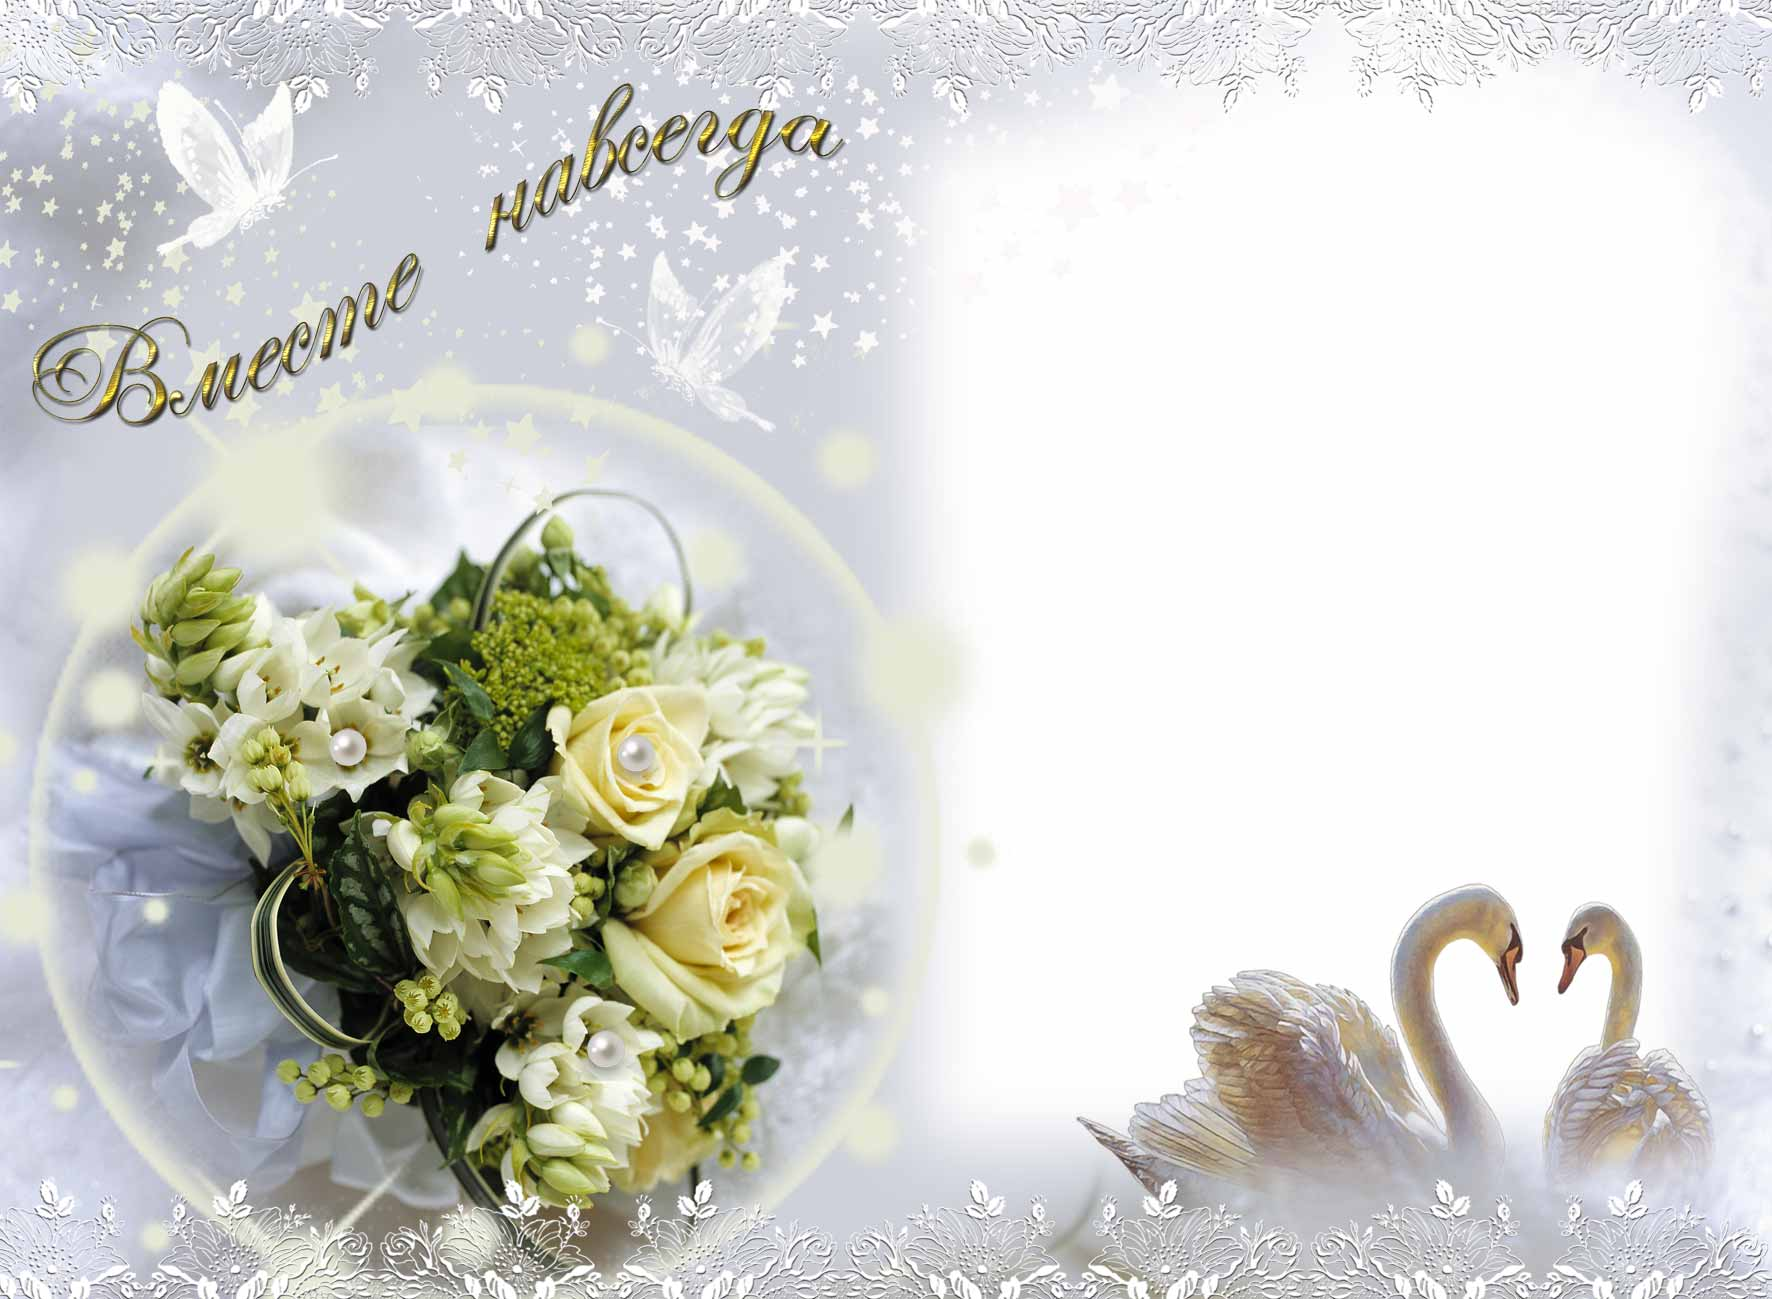 http://img-fotki.yandex.ru/get/9806/97761520.4b4/0_8f23e_5cd98ca3_orig.jpg